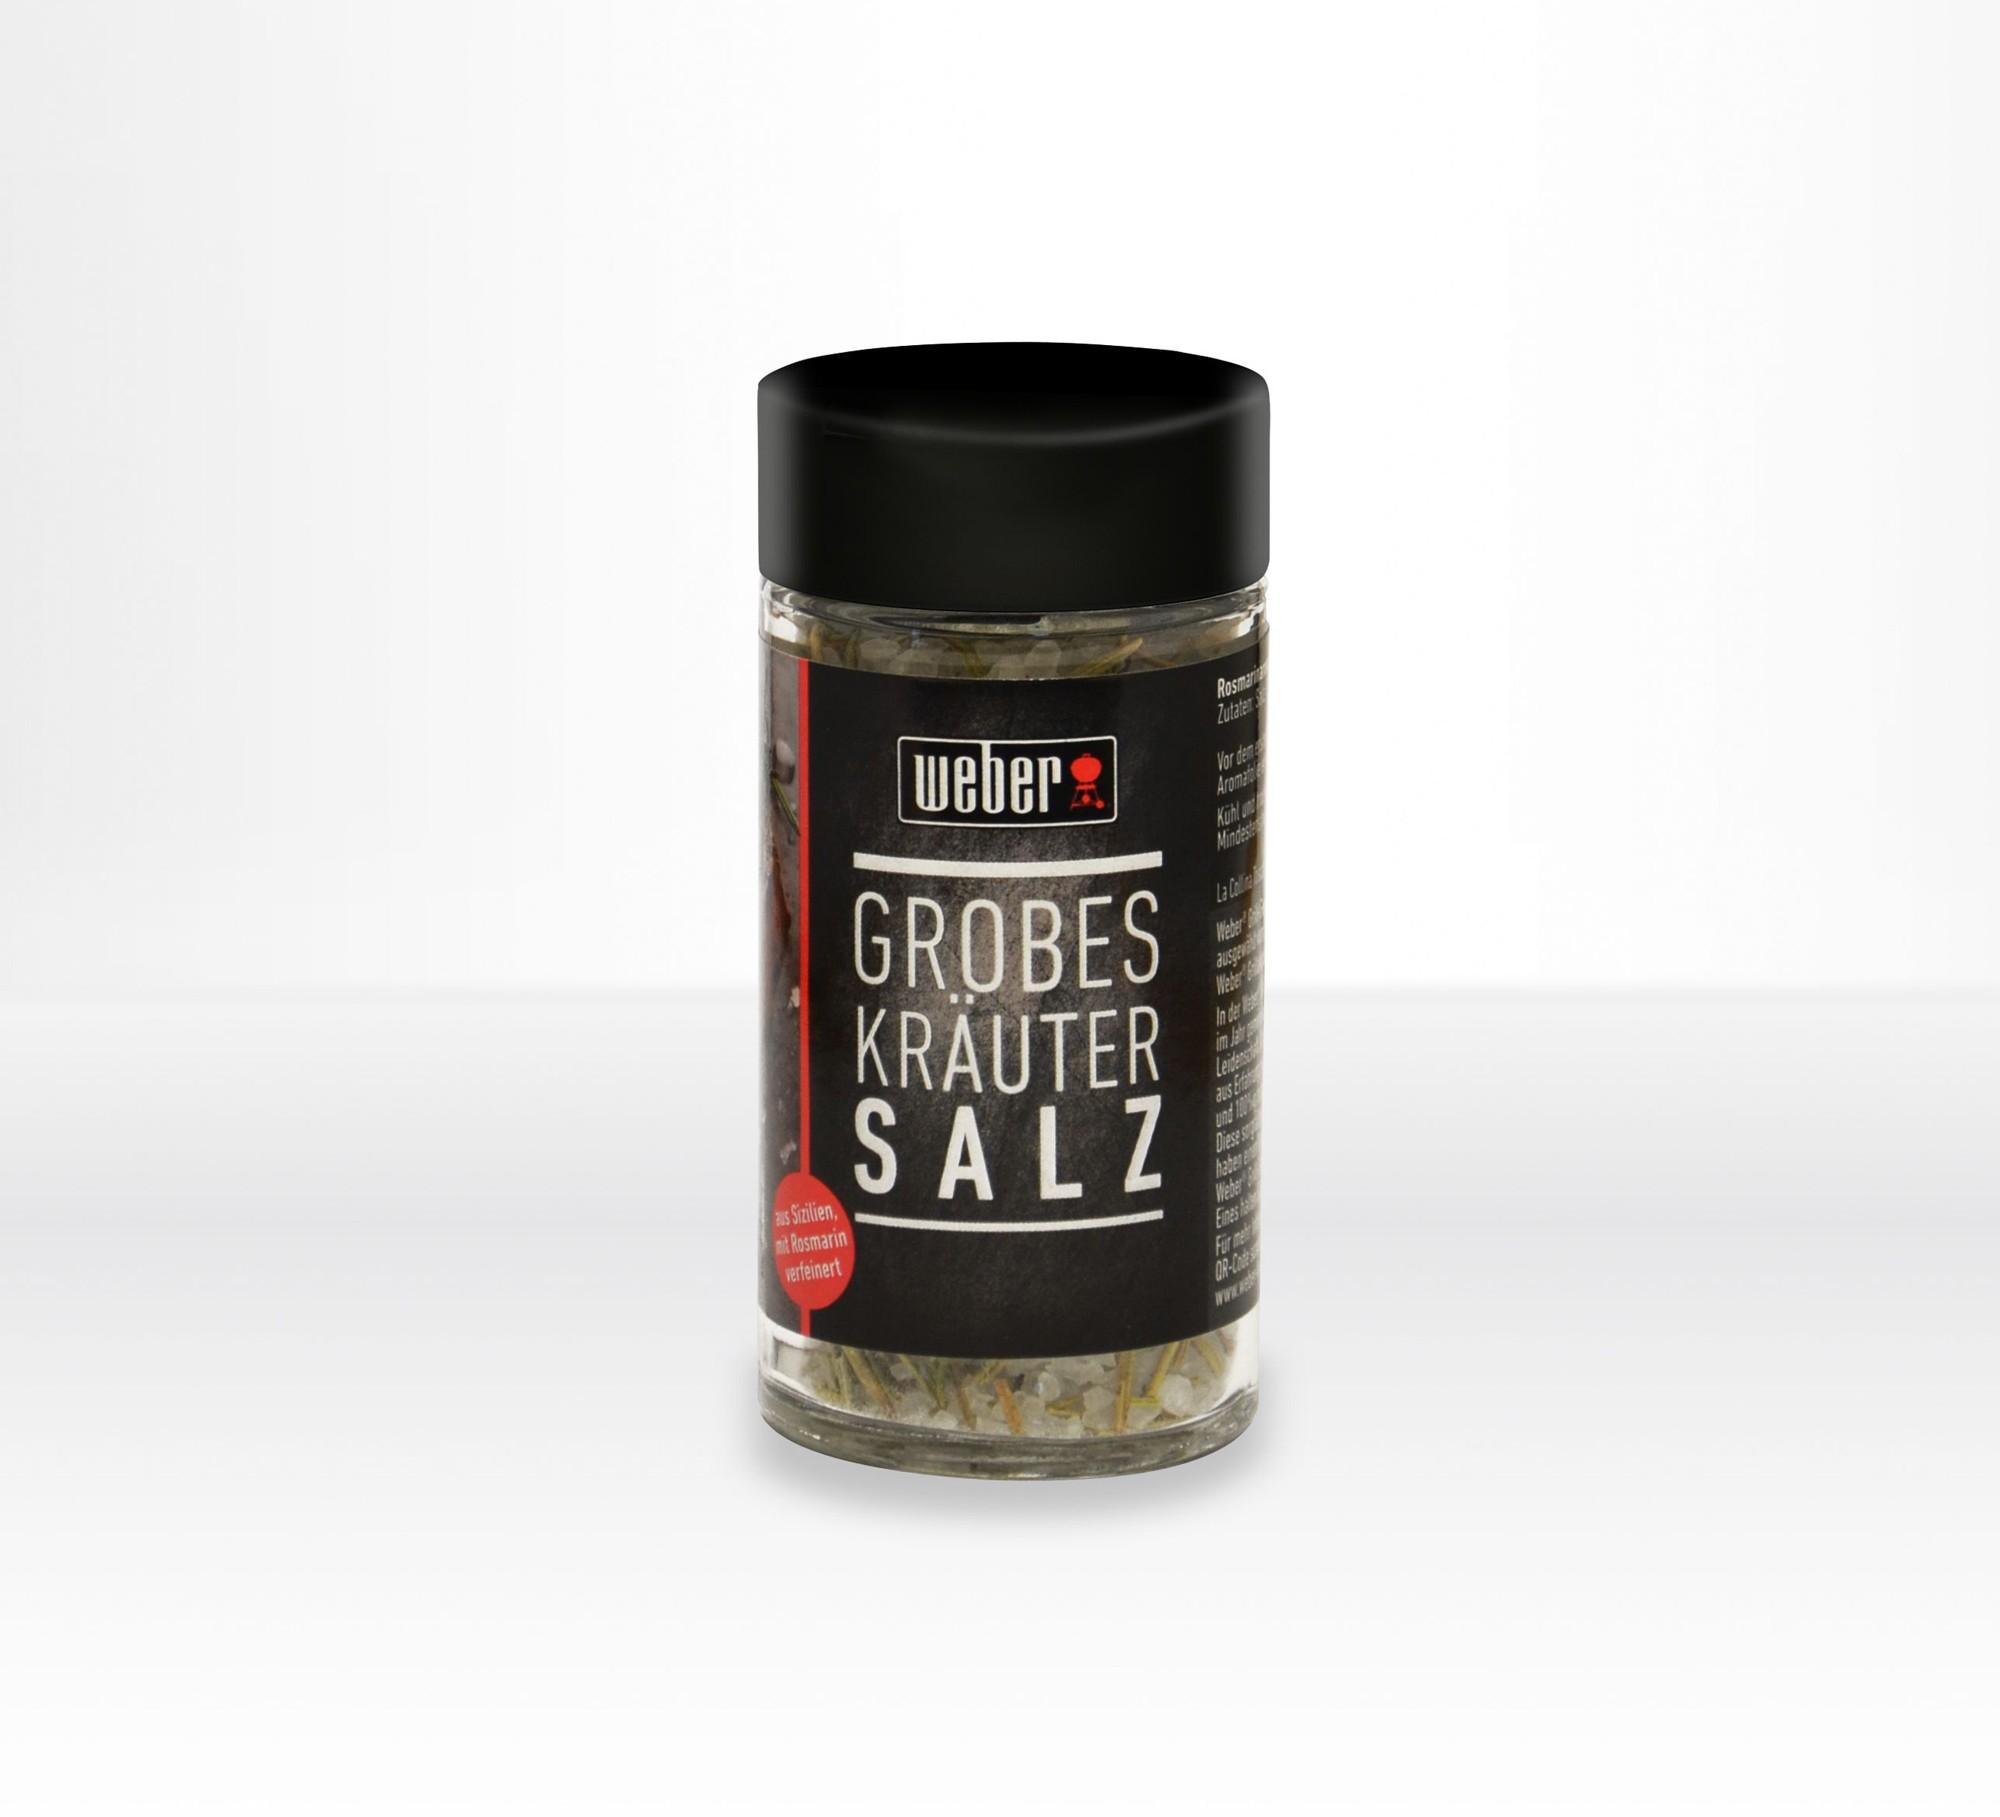 Weber Gewürz / Nachfüllglas Grobes Gewürz Salz 80 g Bild 1